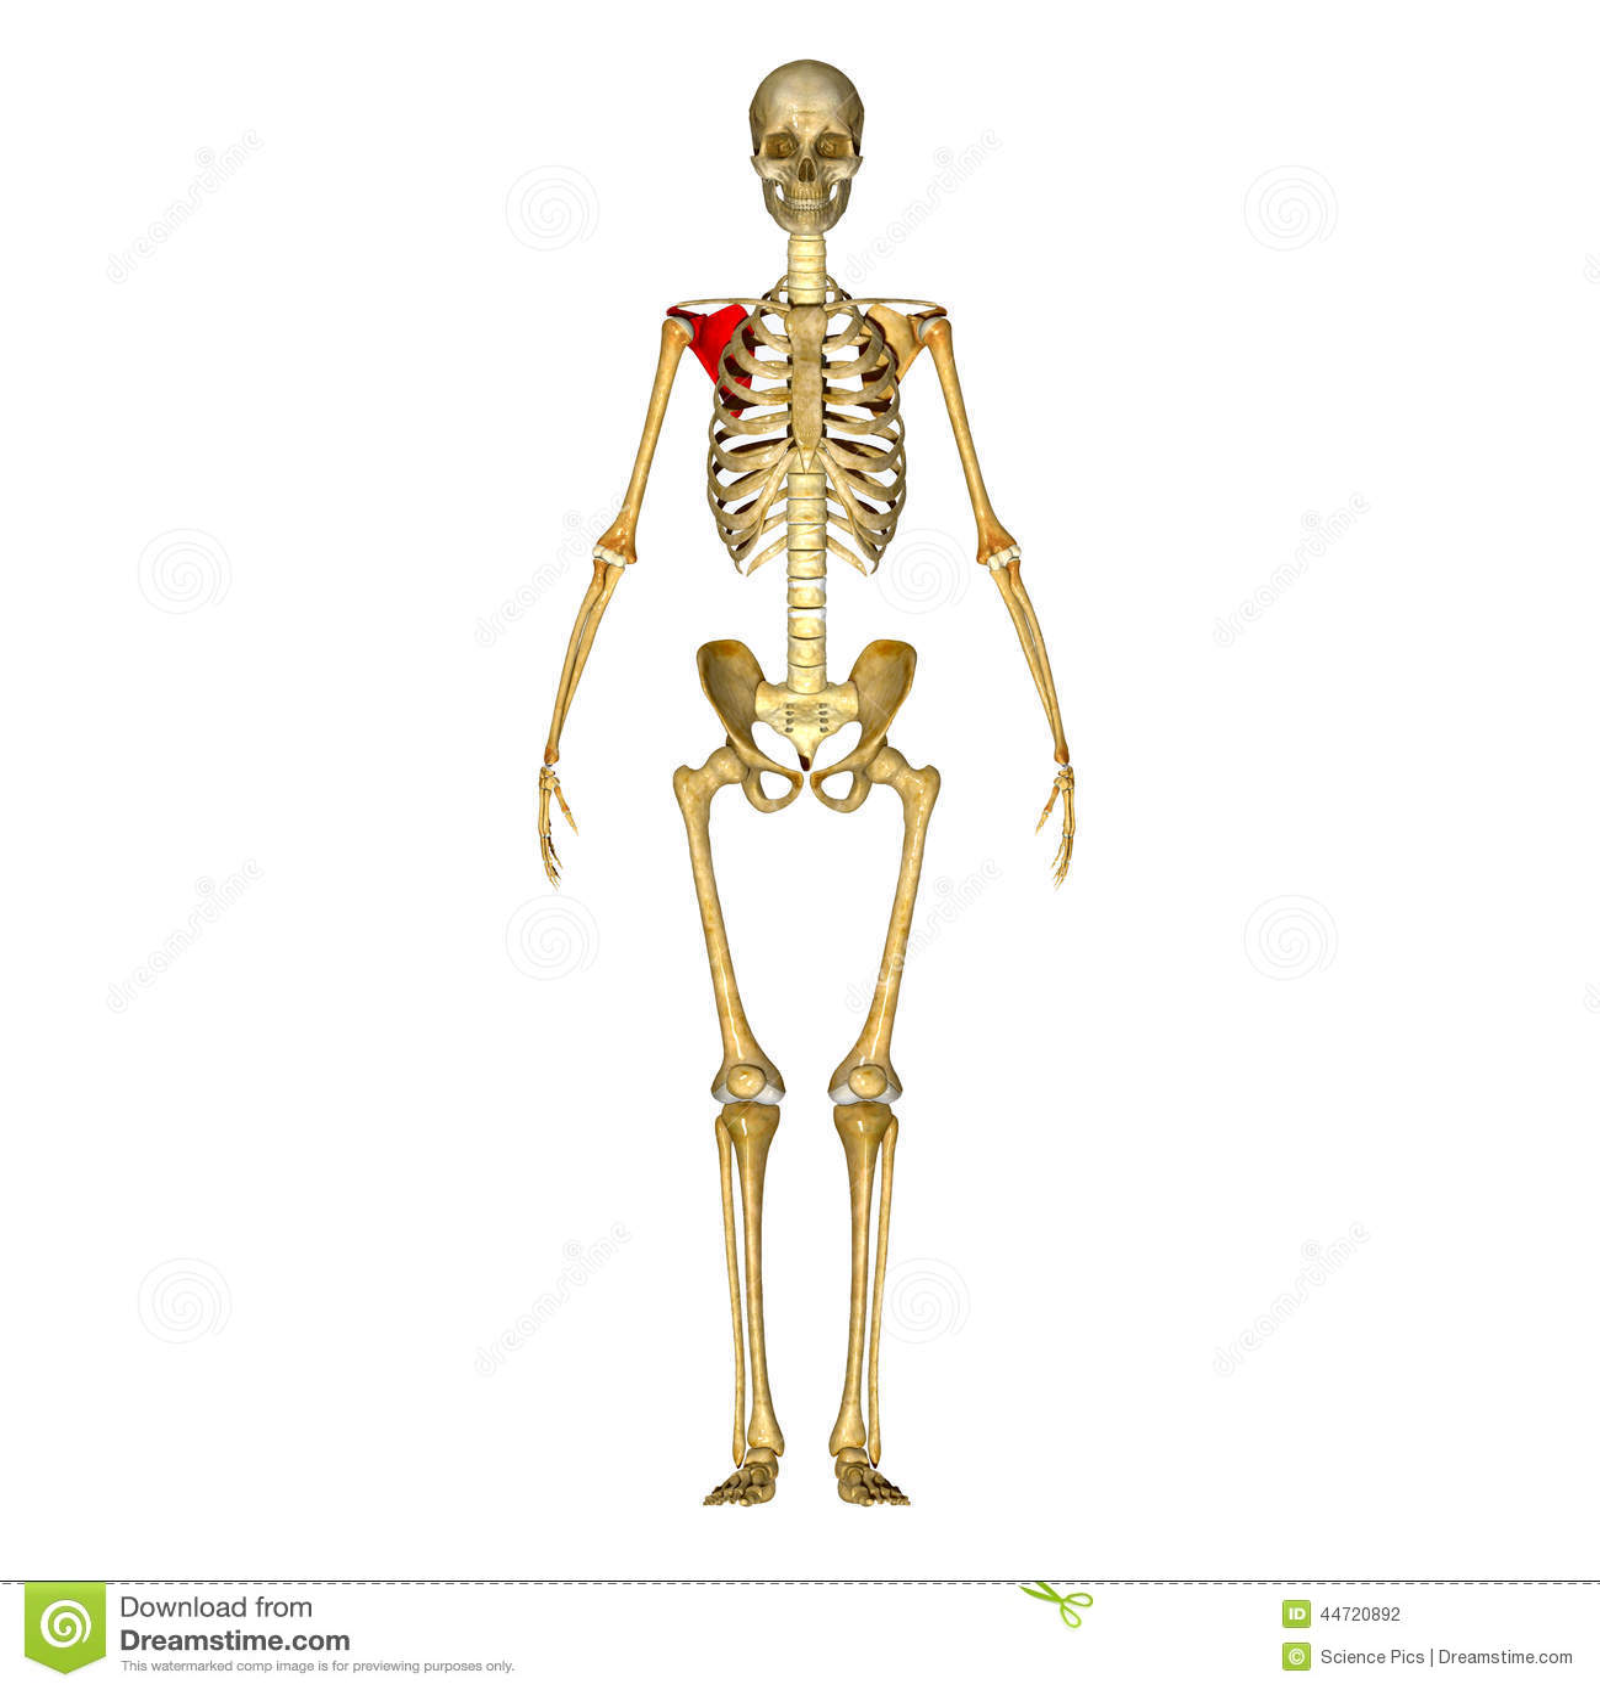 Scapula stock illustration. Illustration of body, medical - 44720892